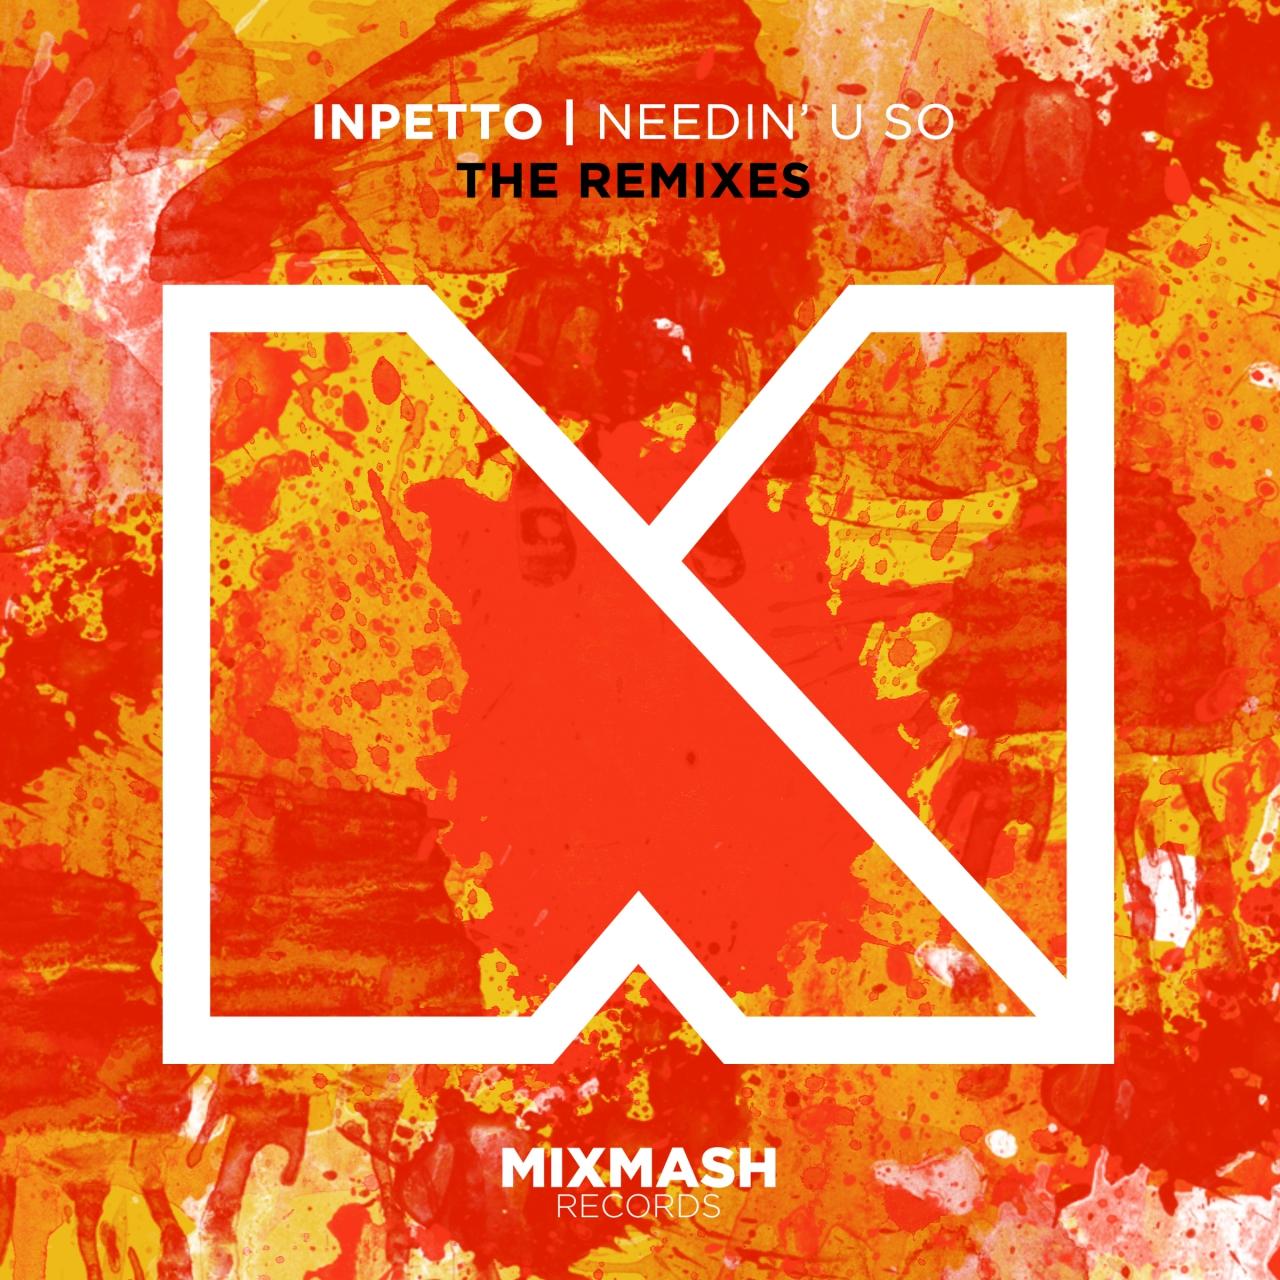 Needin' U So (Remixes)